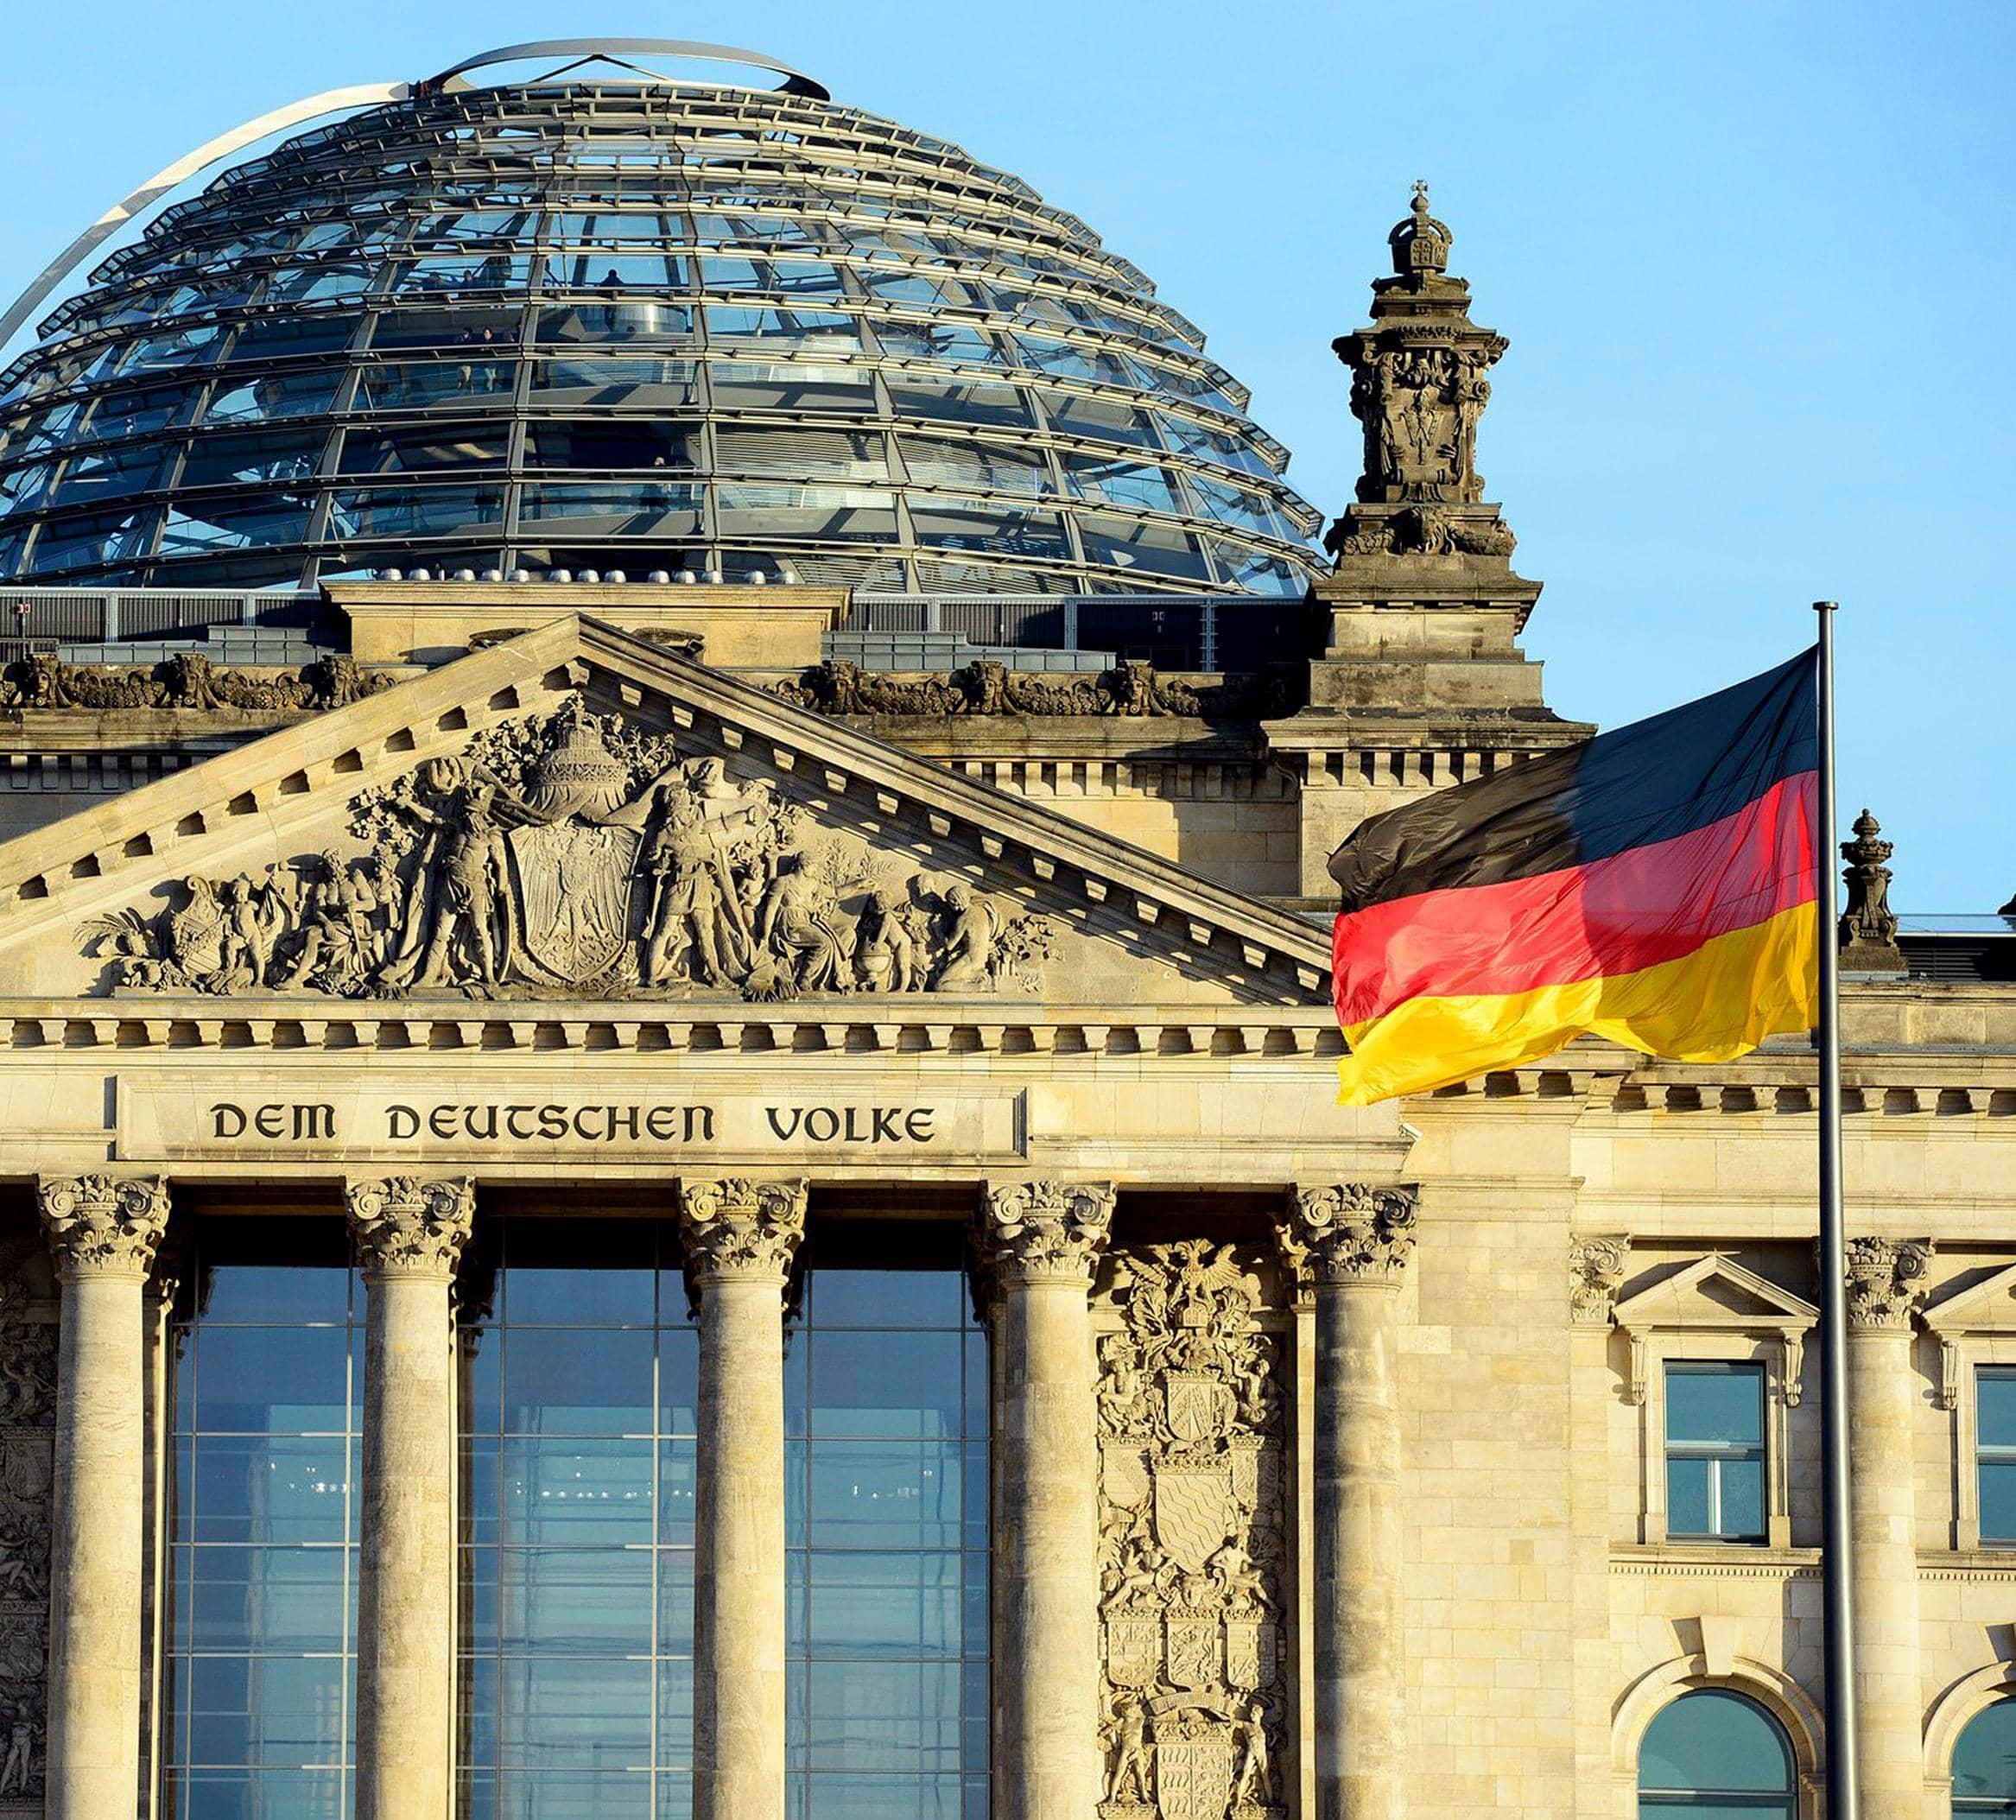 GERMAN LASER TECH COMPANY SAYS GOV'T BLOCKS EXPORTS TO CHINA